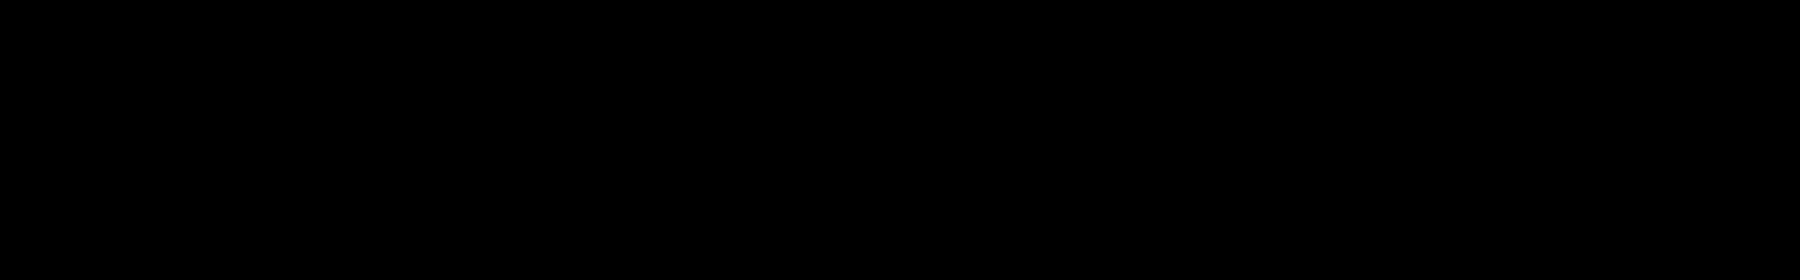 Lifeform Reaktor audio waveform